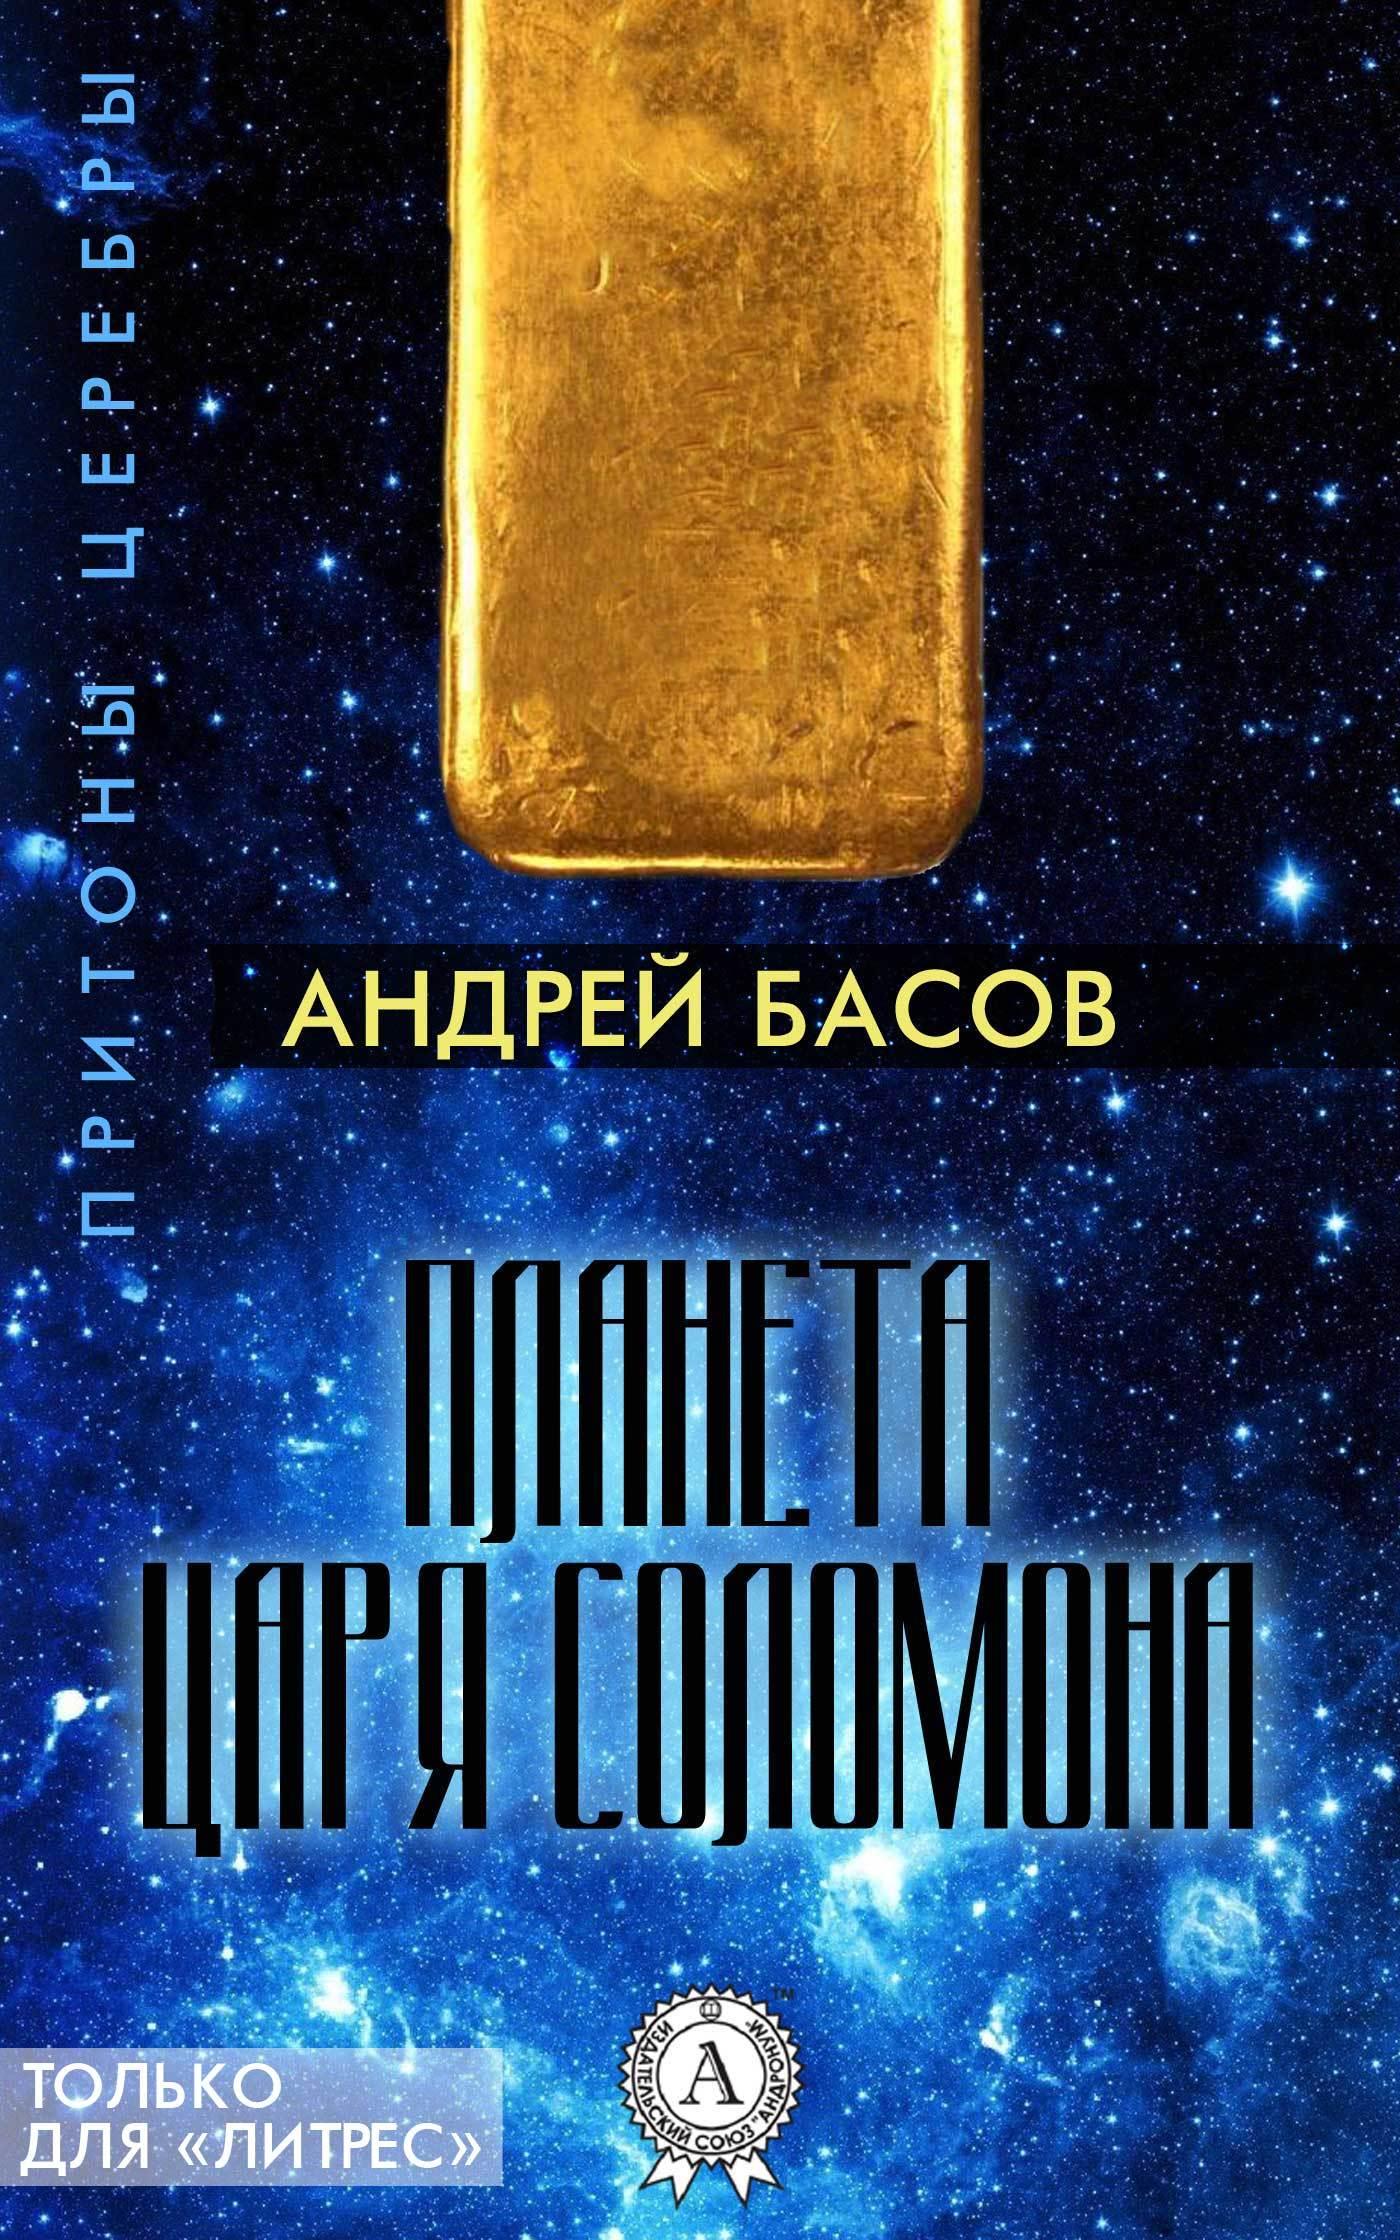 Андрей Басов Планета царя Соломона манипулятор 40 тонн астана